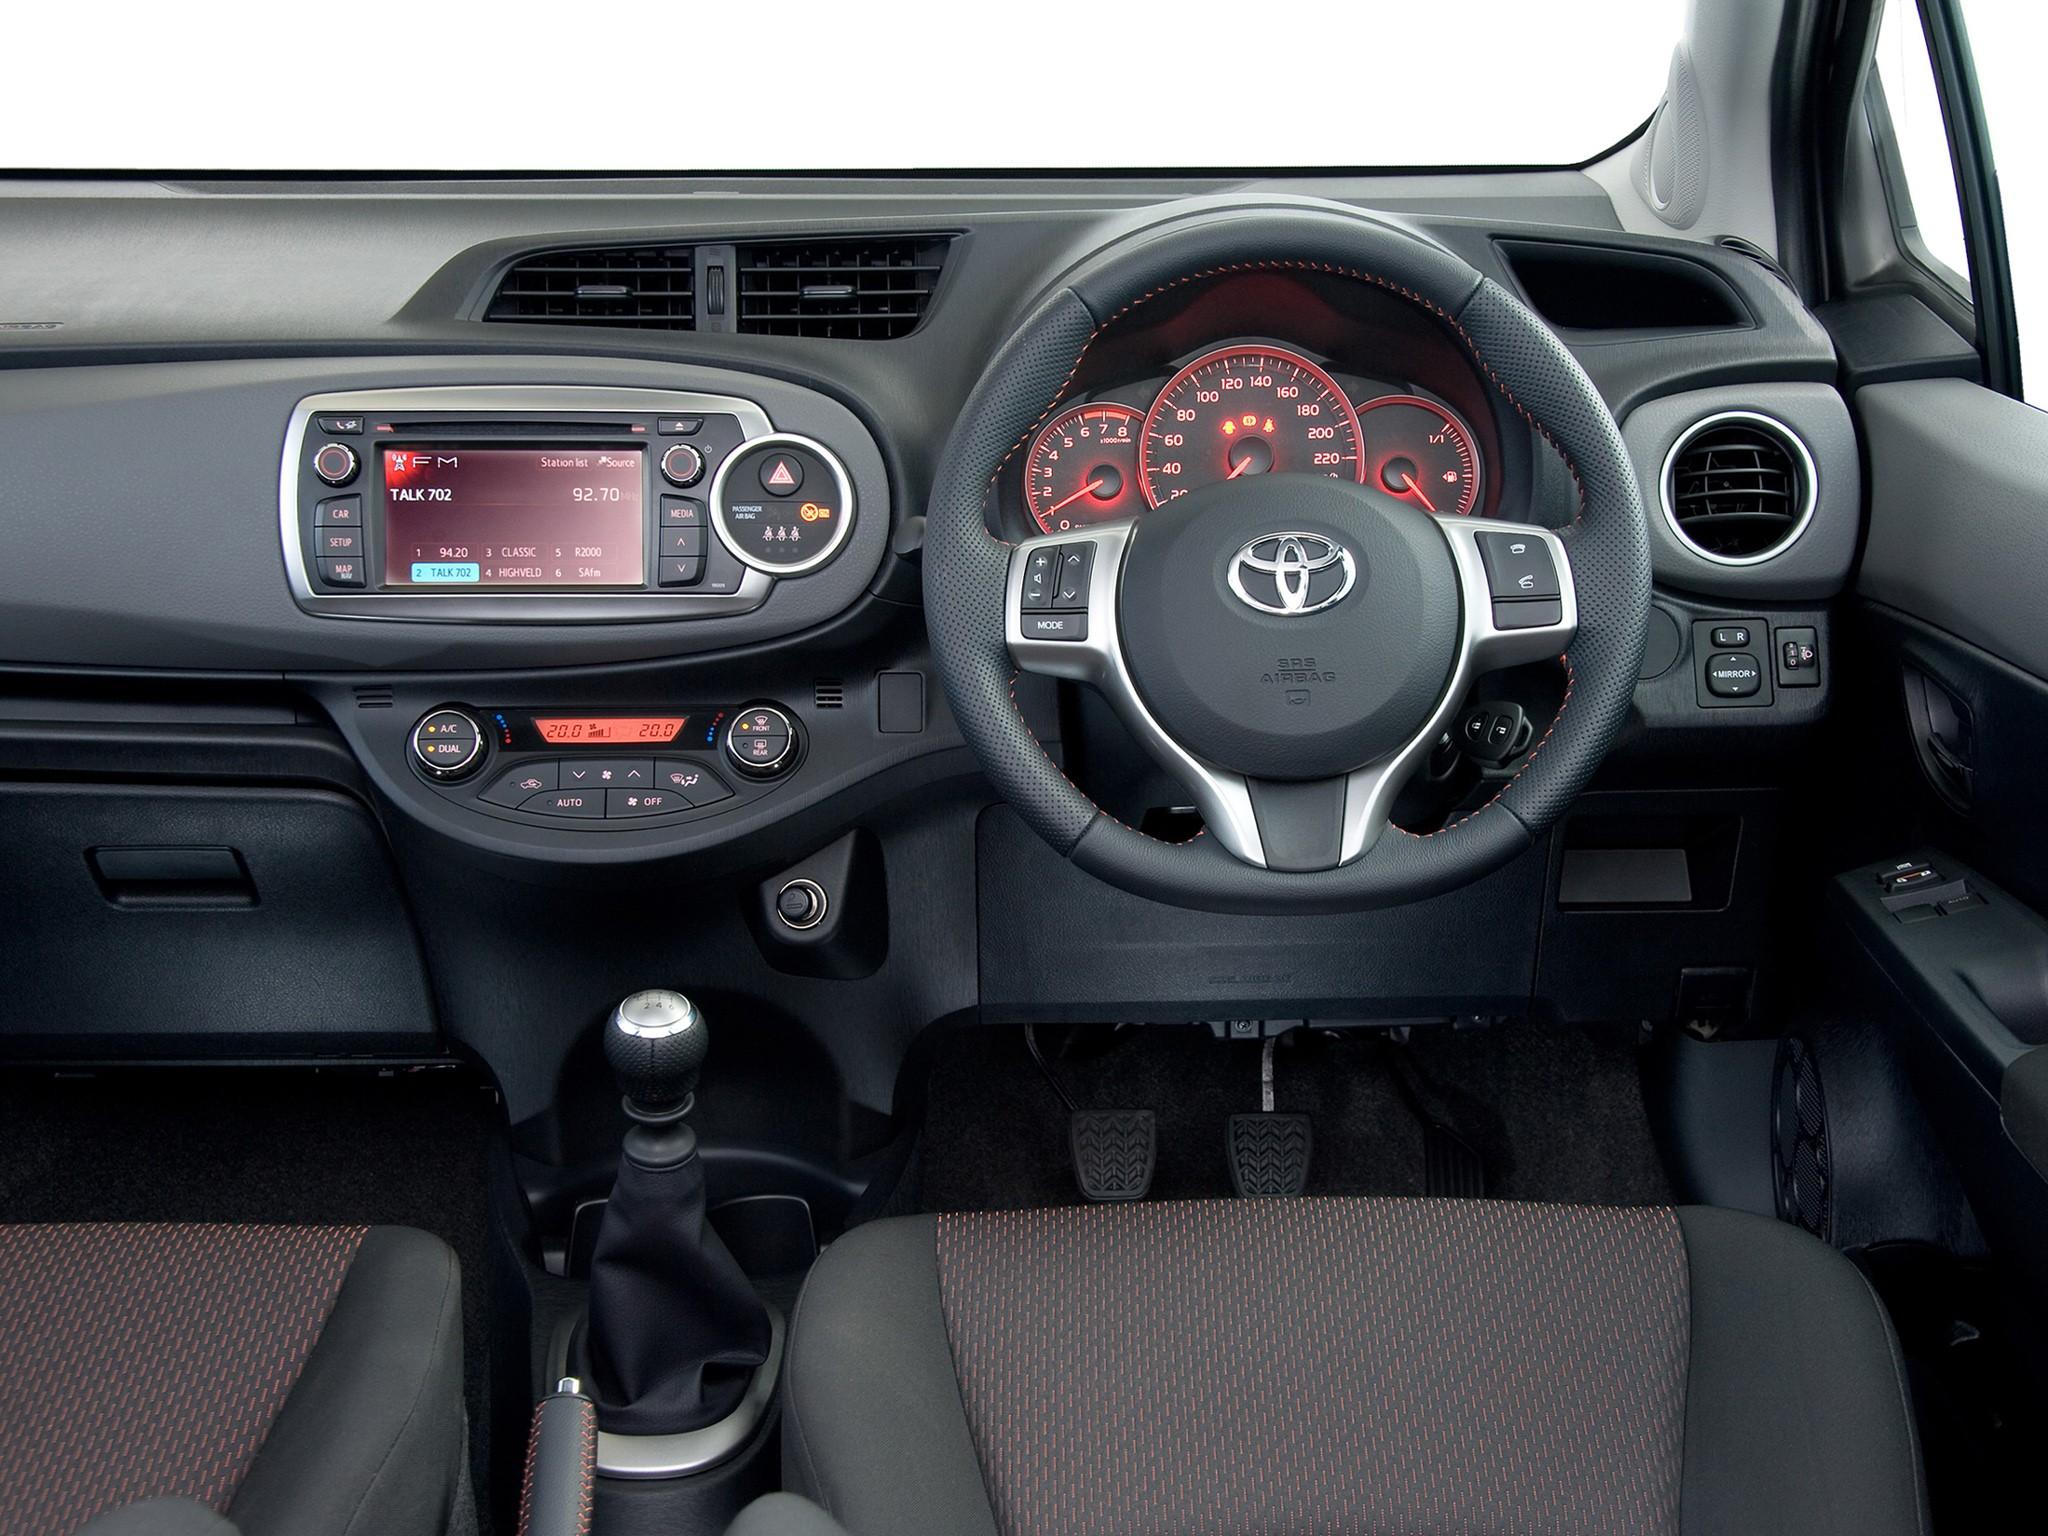 2014 Toyota Corolla Mpg >> TOYOTA Yaris 3 Doors specs & photos - 2011, 2012, 2013, 2014 - autoevolution